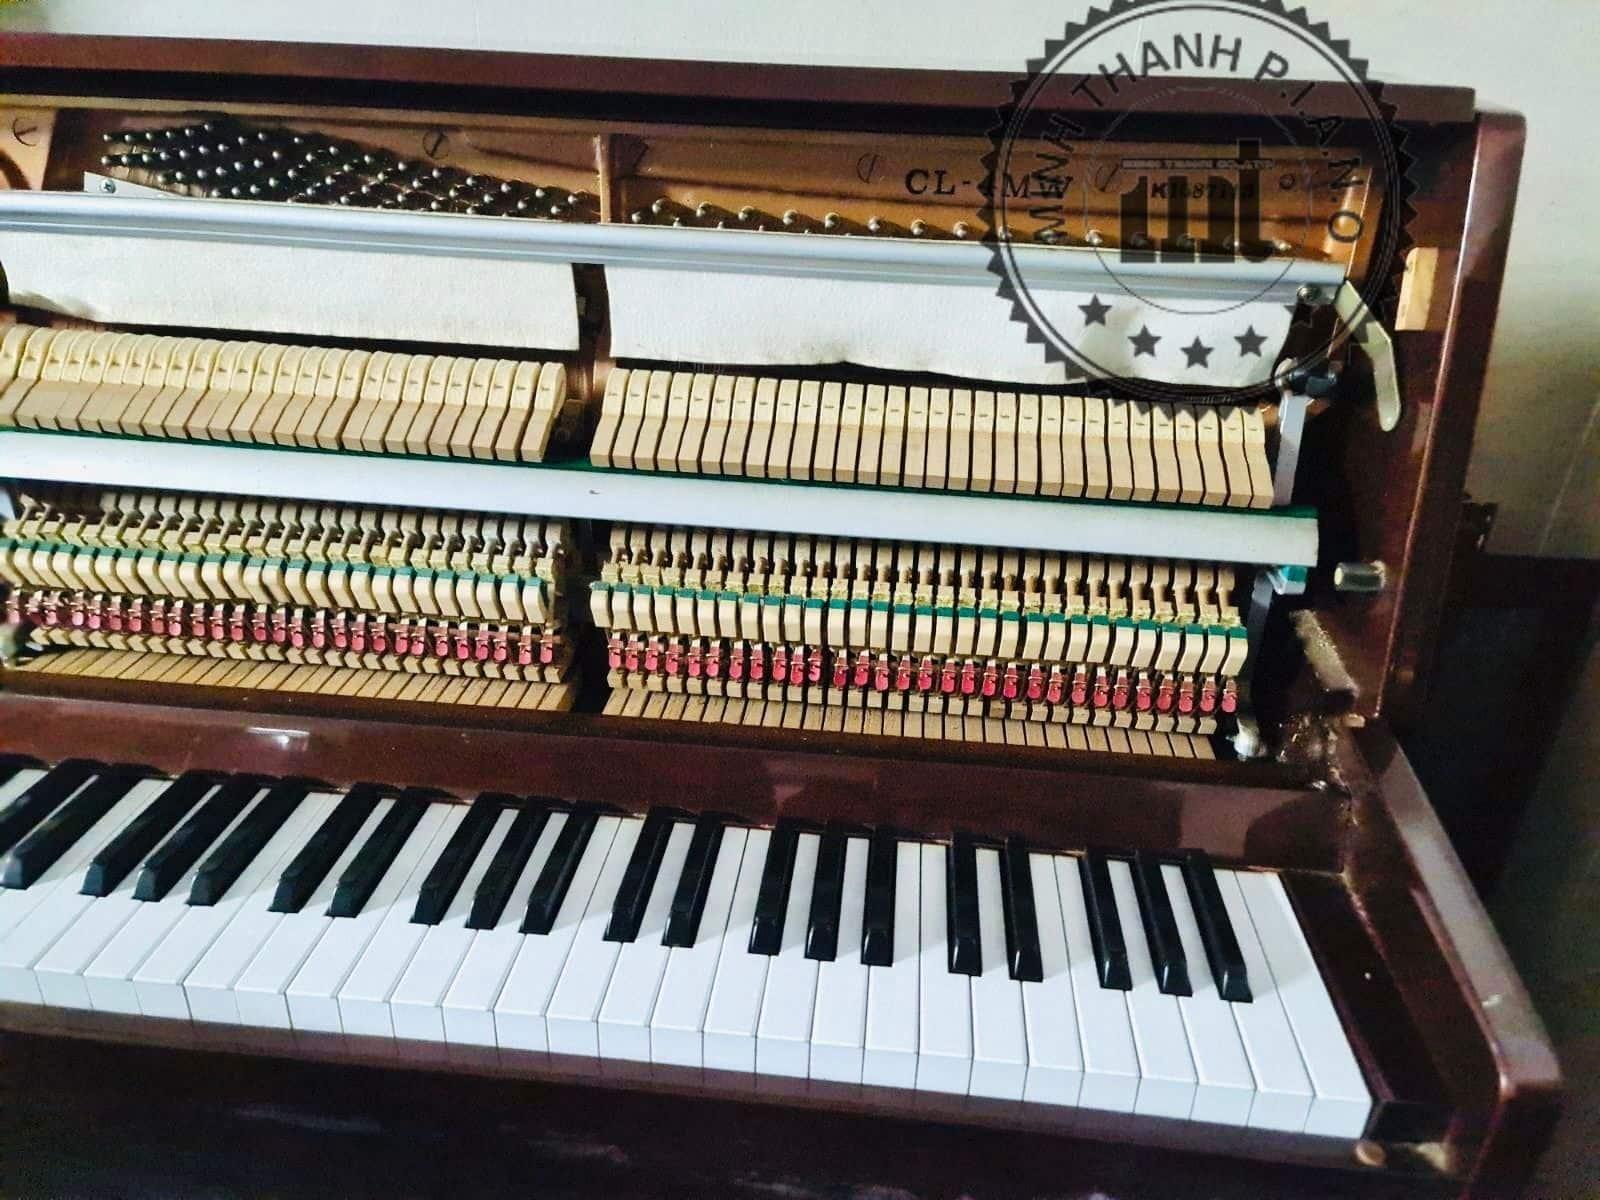 Đàn Piano Kawai CL-4MW